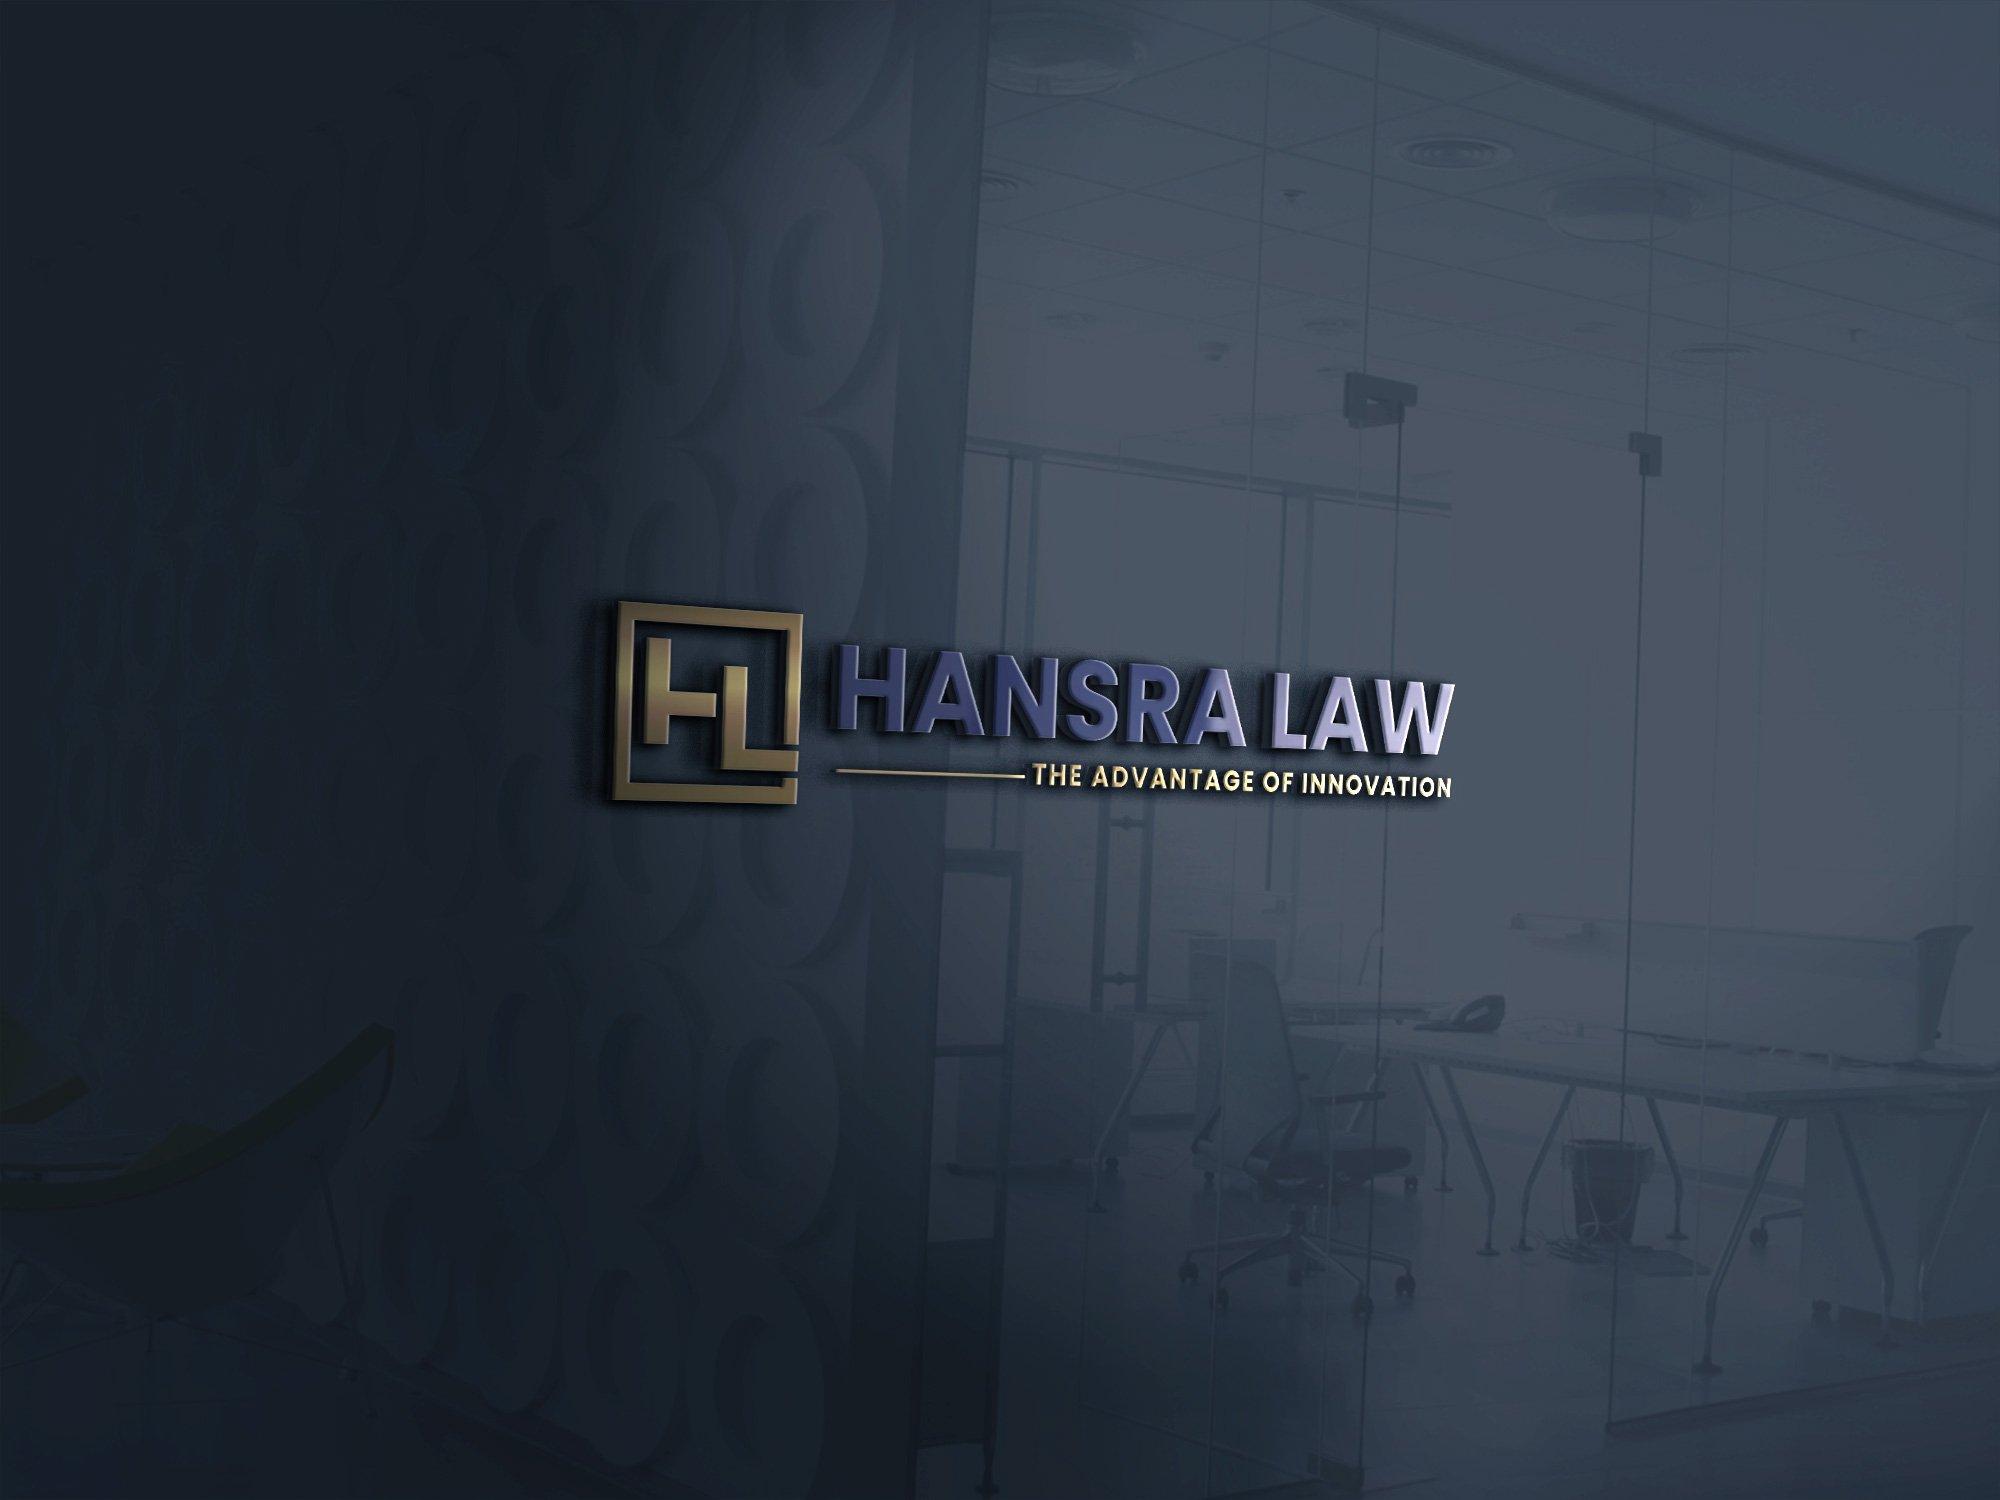 Hansra Law business lawyer Toronto name plate